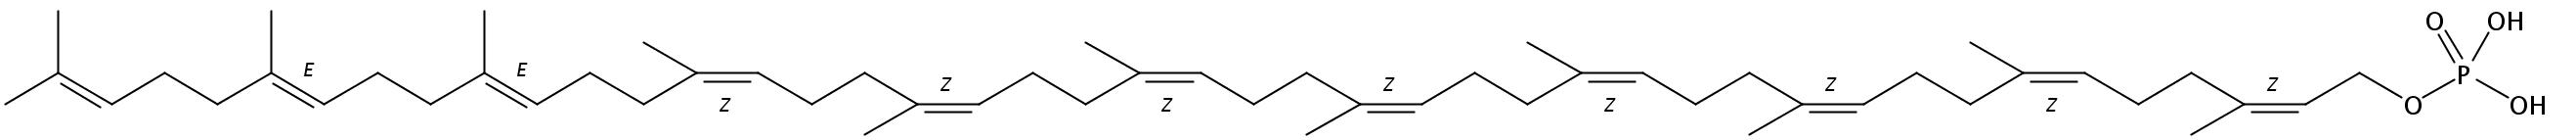 Structural formula of Undecaprenyl-MPDA monophosphate (NH4+)2